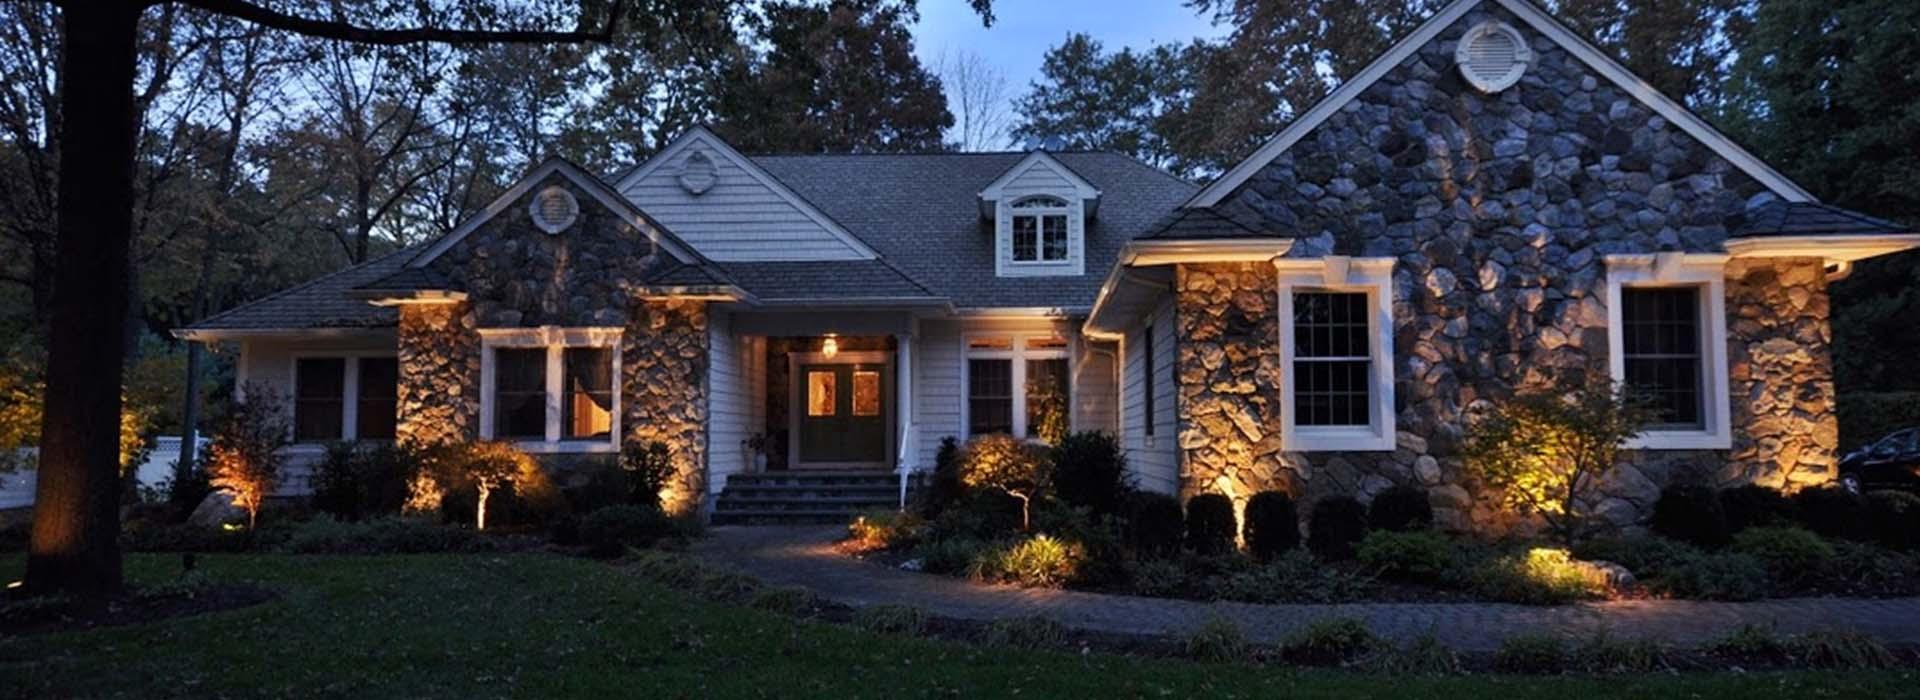 outdoor landscape lighting QBBGWKI